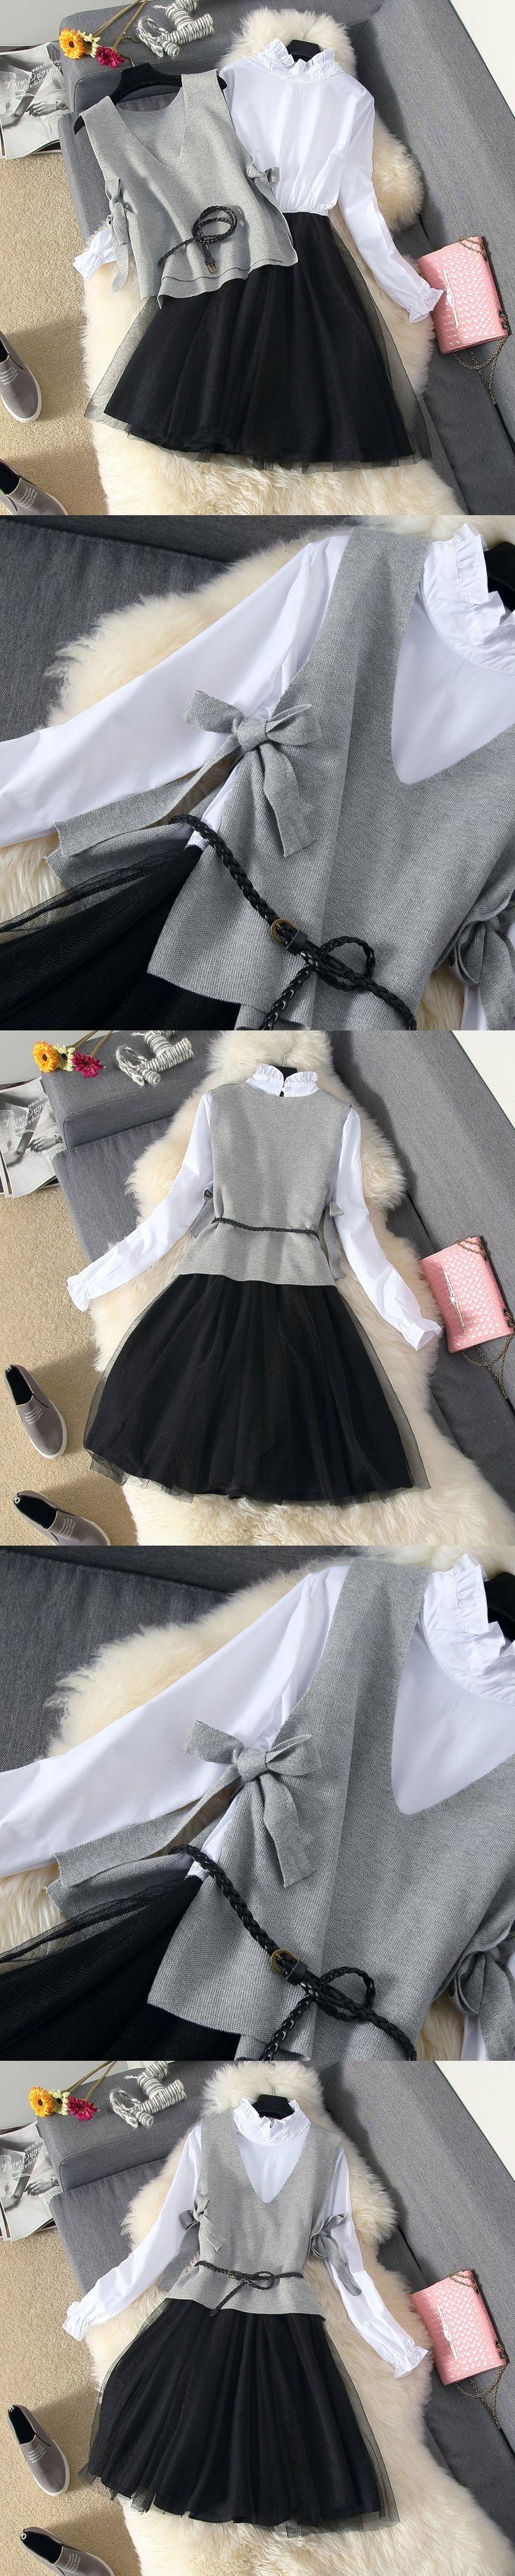 2017 Women Autumn Winter Two Piece Suit Lady Fashion Shirt Patchwork Gauze Dress + Gray Knitted Vest Tops Set Students Wear